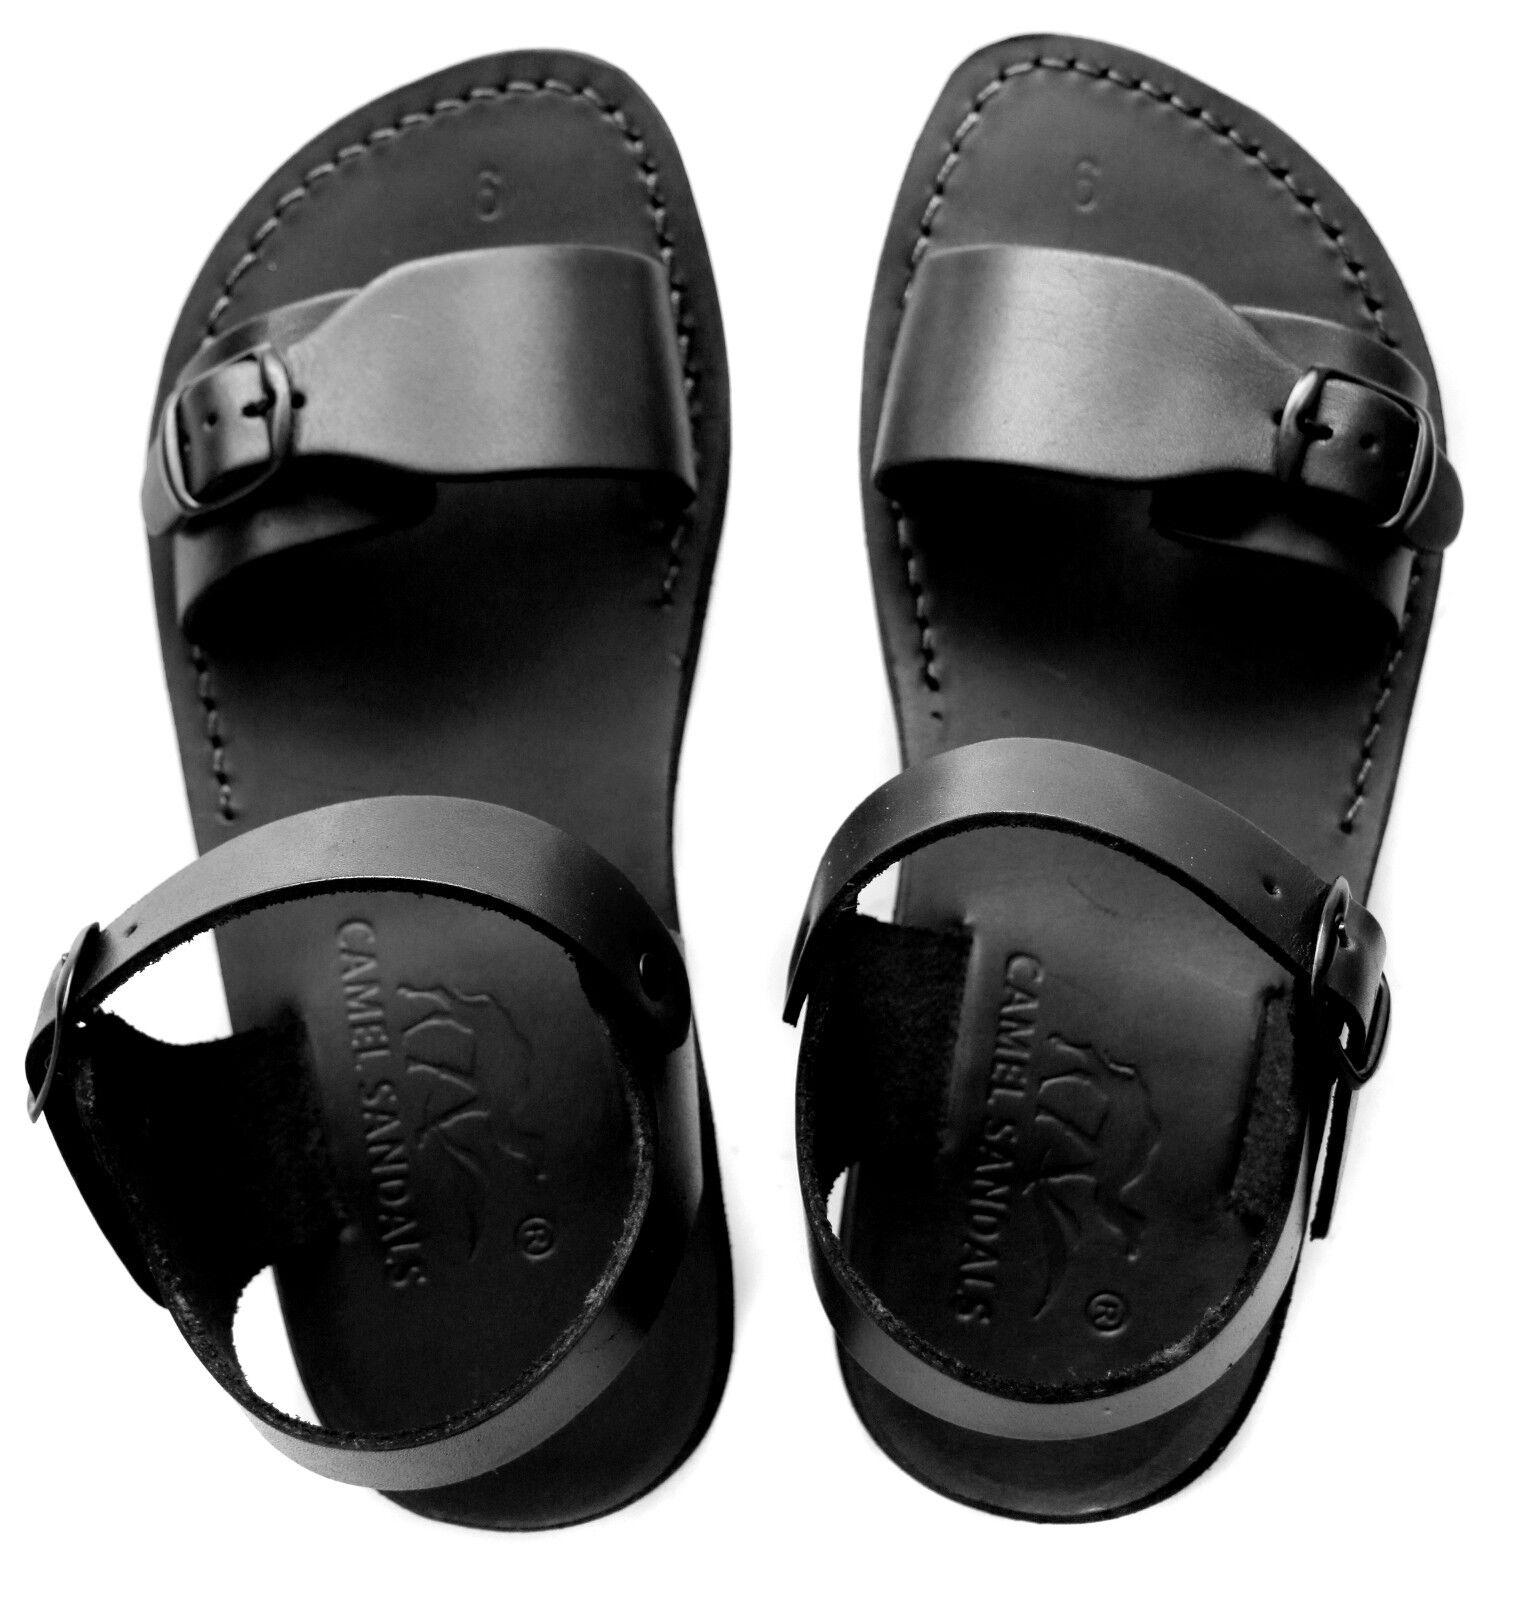 Leather Jesus Mens Black Canaan Sandals Gladiator shoes UK Size 4-12 EU 36-47